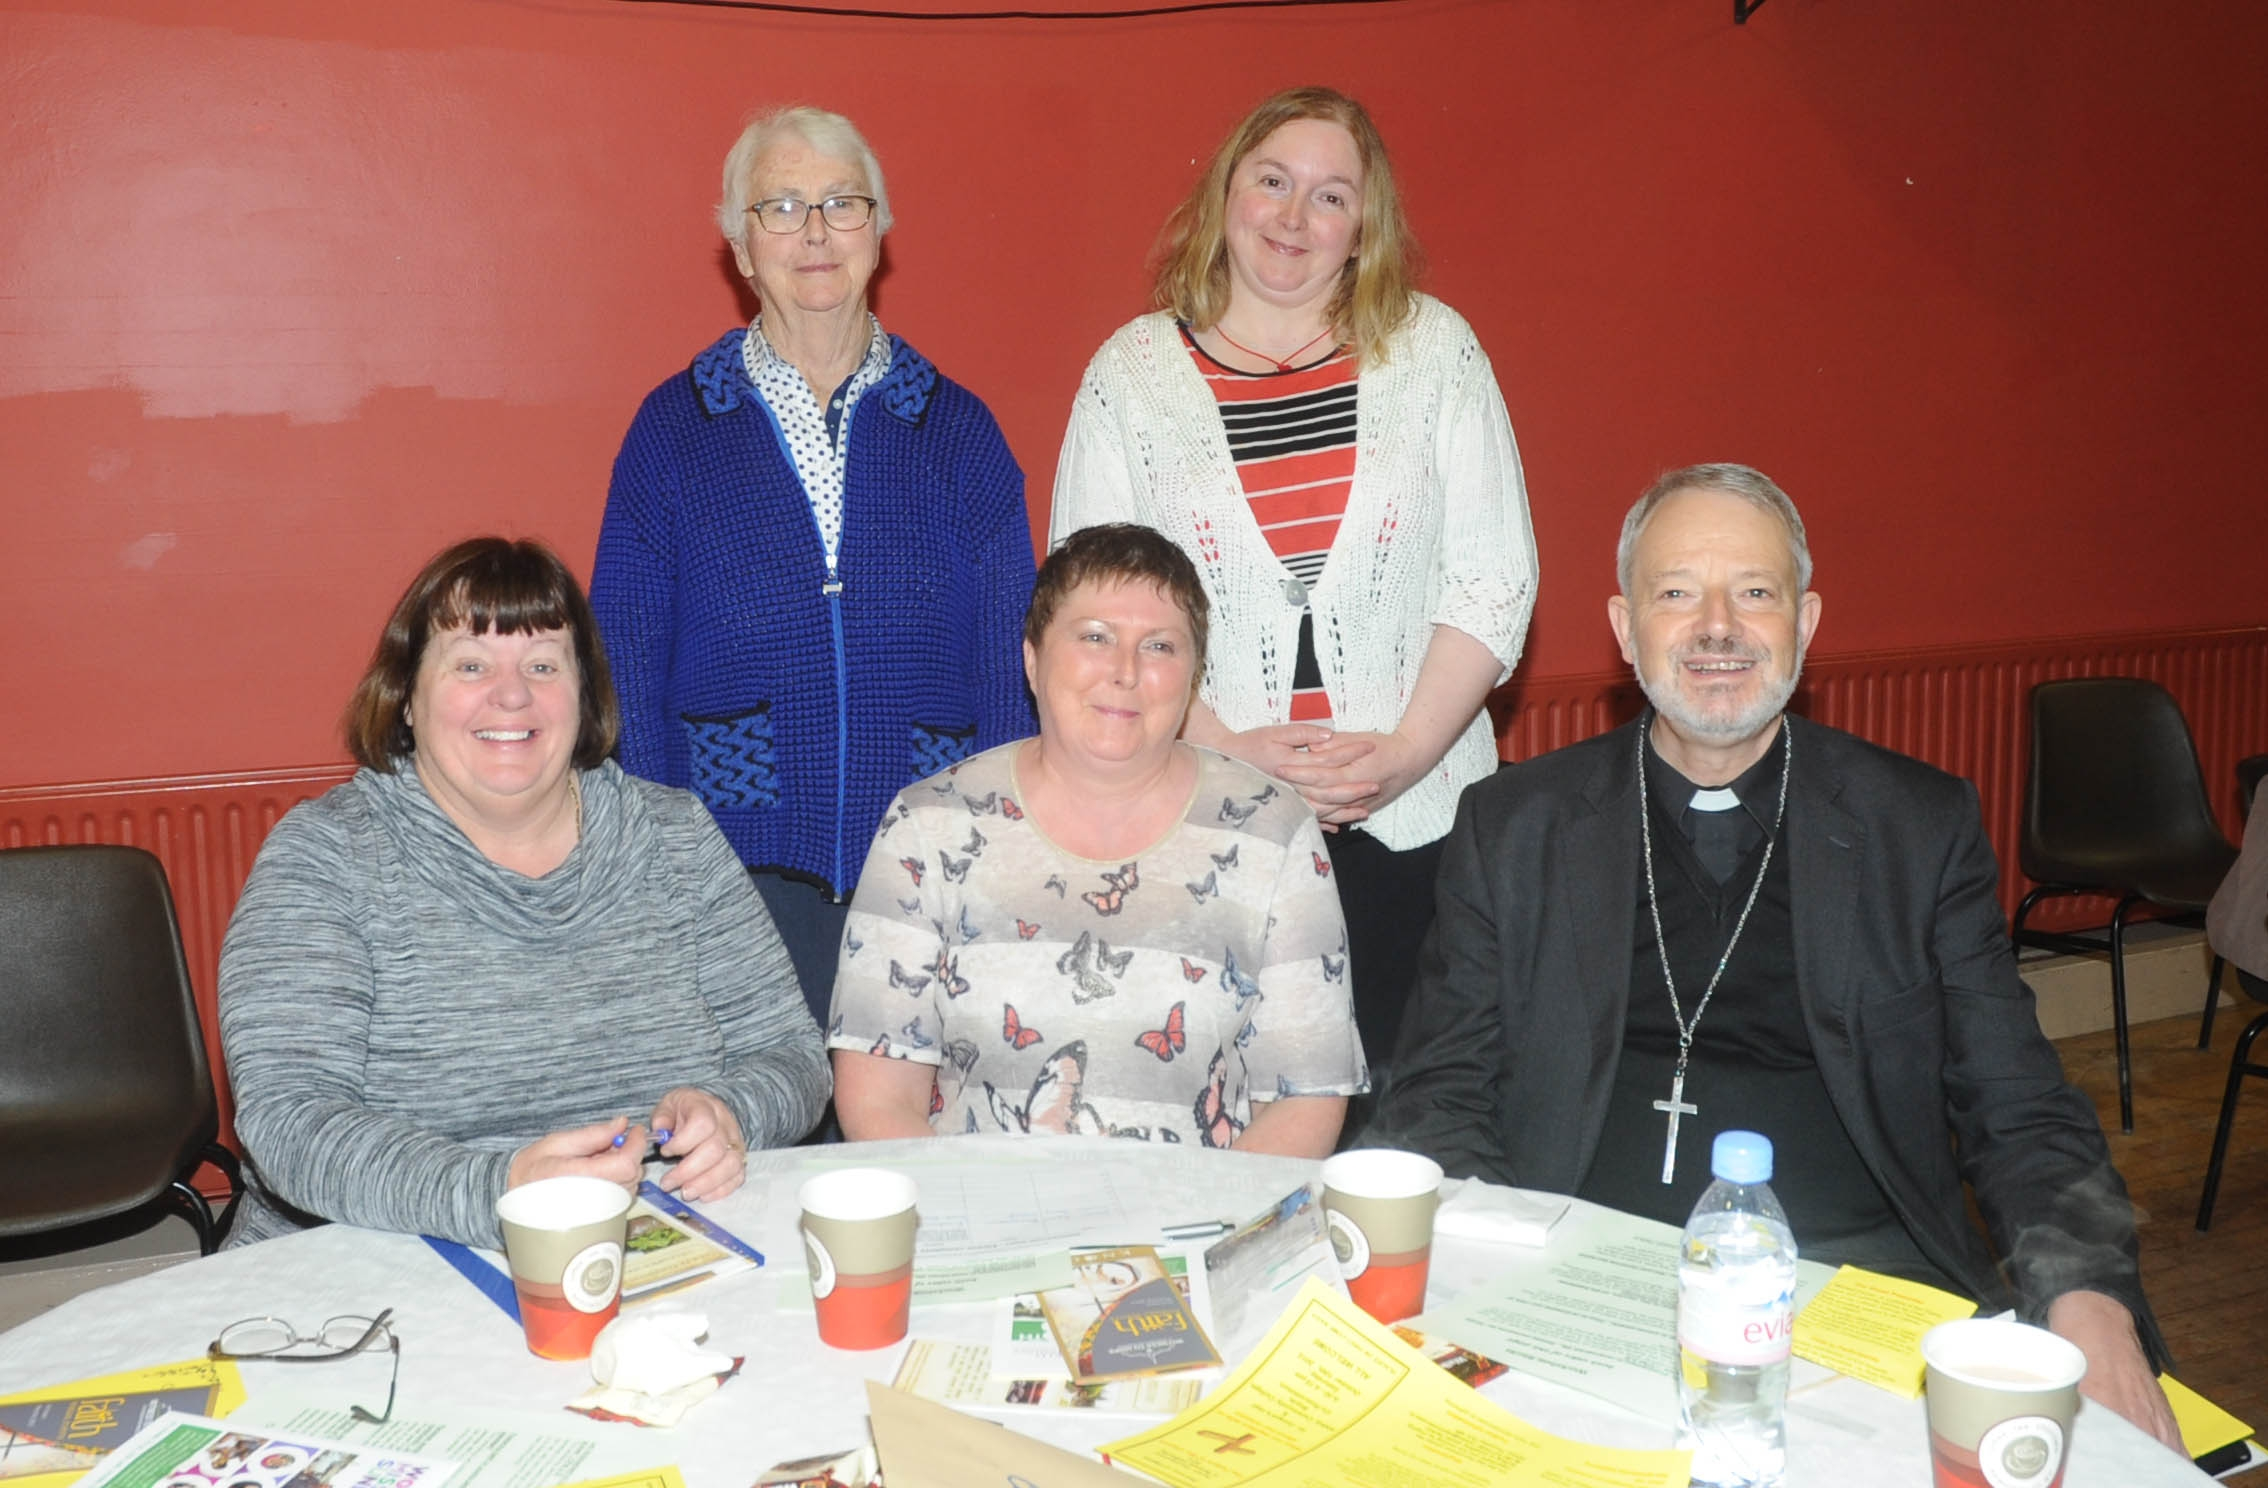 Karen Lyons, Sister 0Maura, Ann Brennan, Vivienne Barry. Bishop k.Doran.